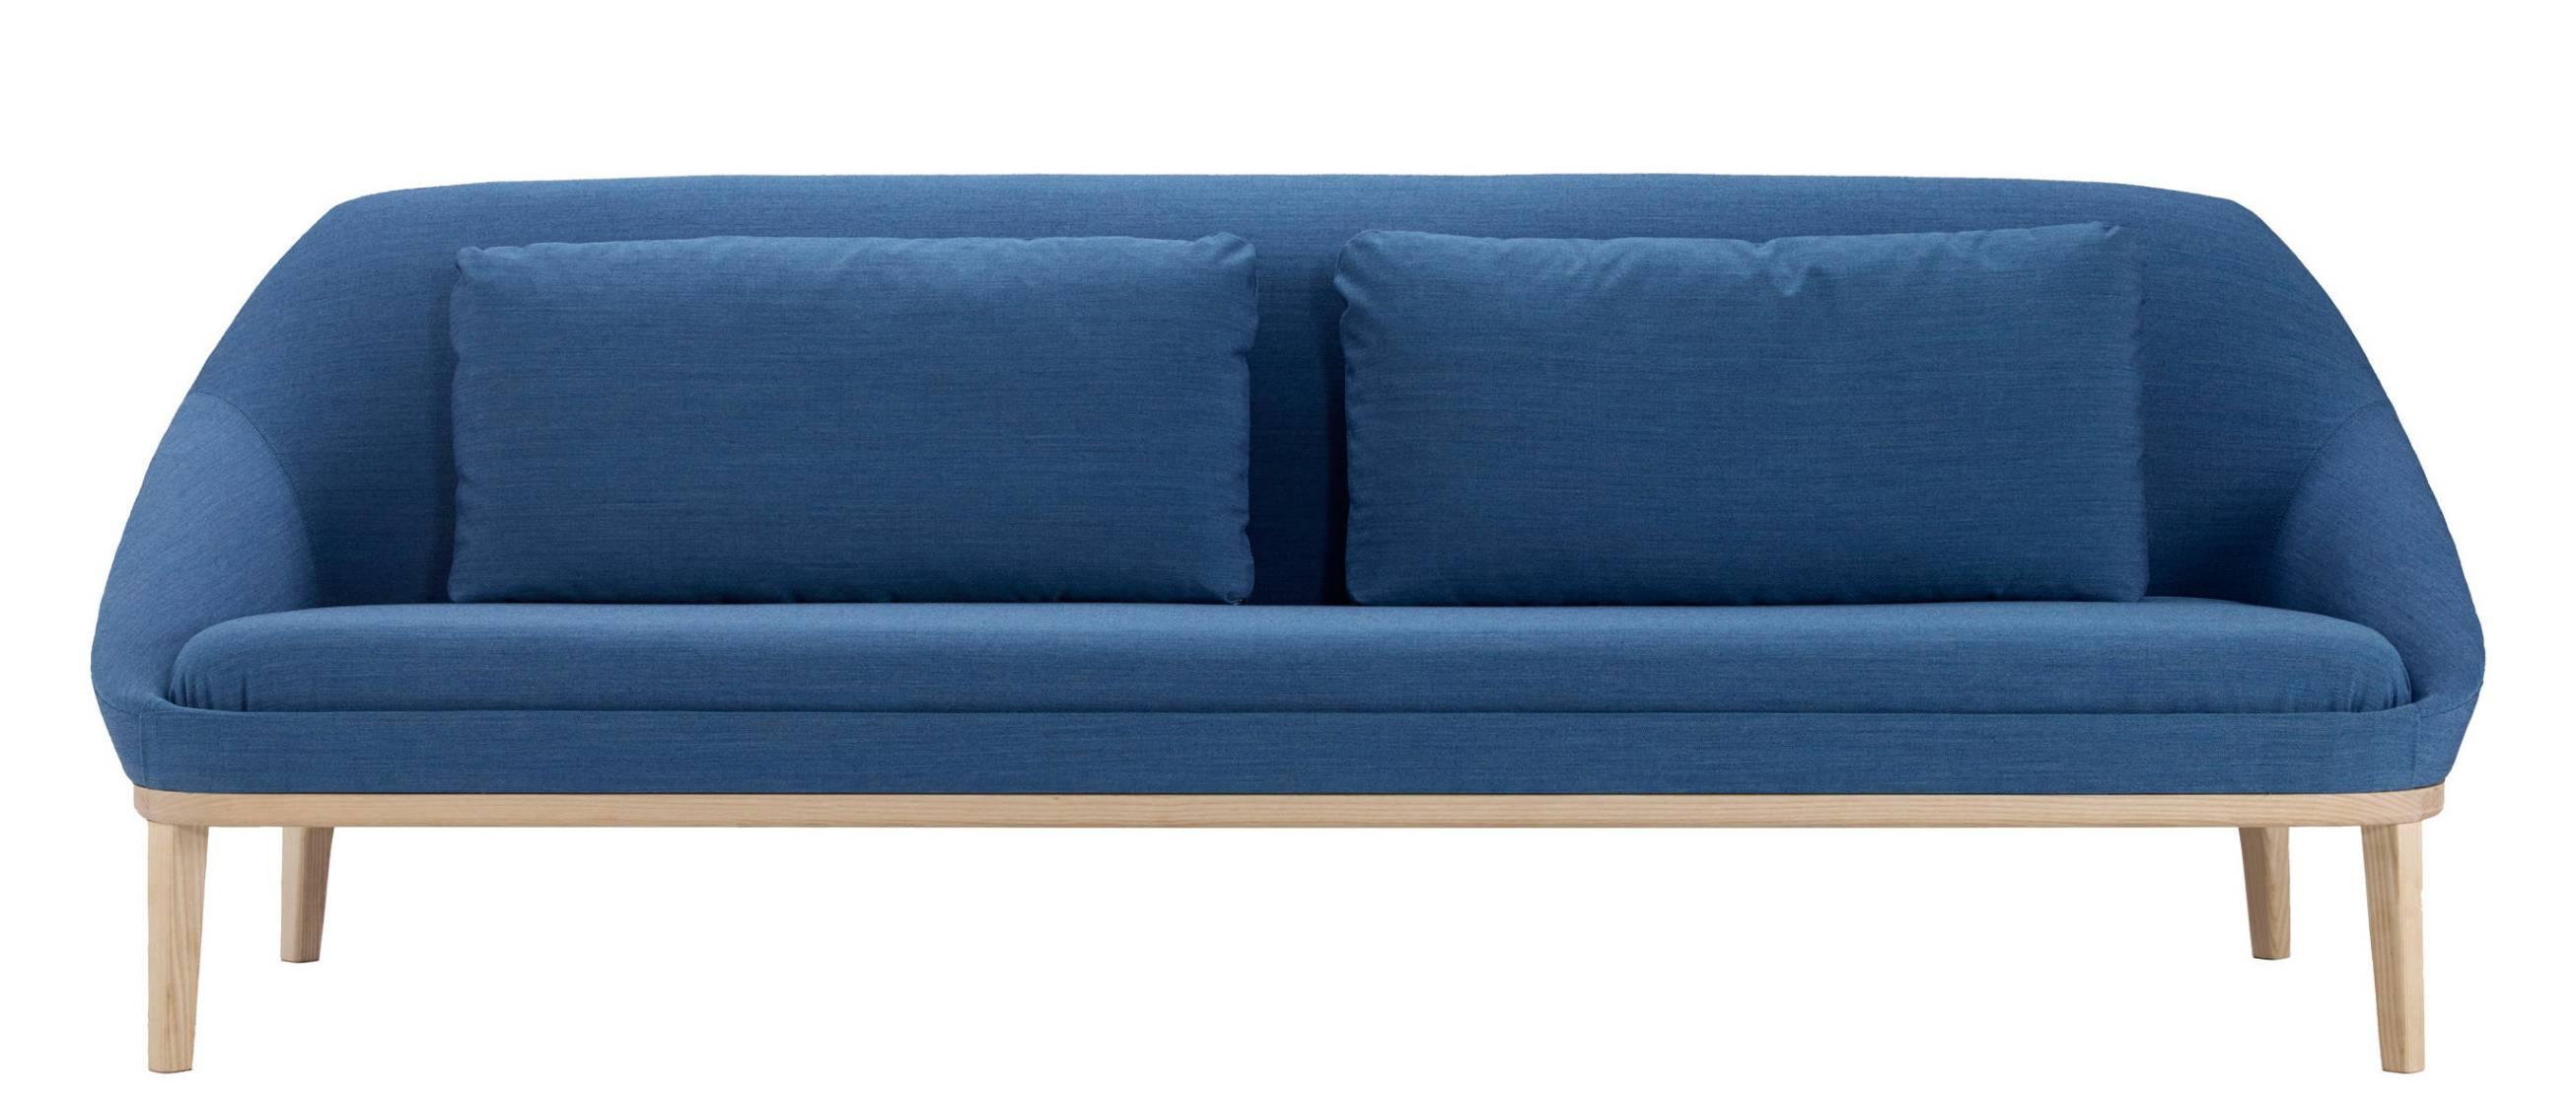 Offecct Ezy Wood Sofa